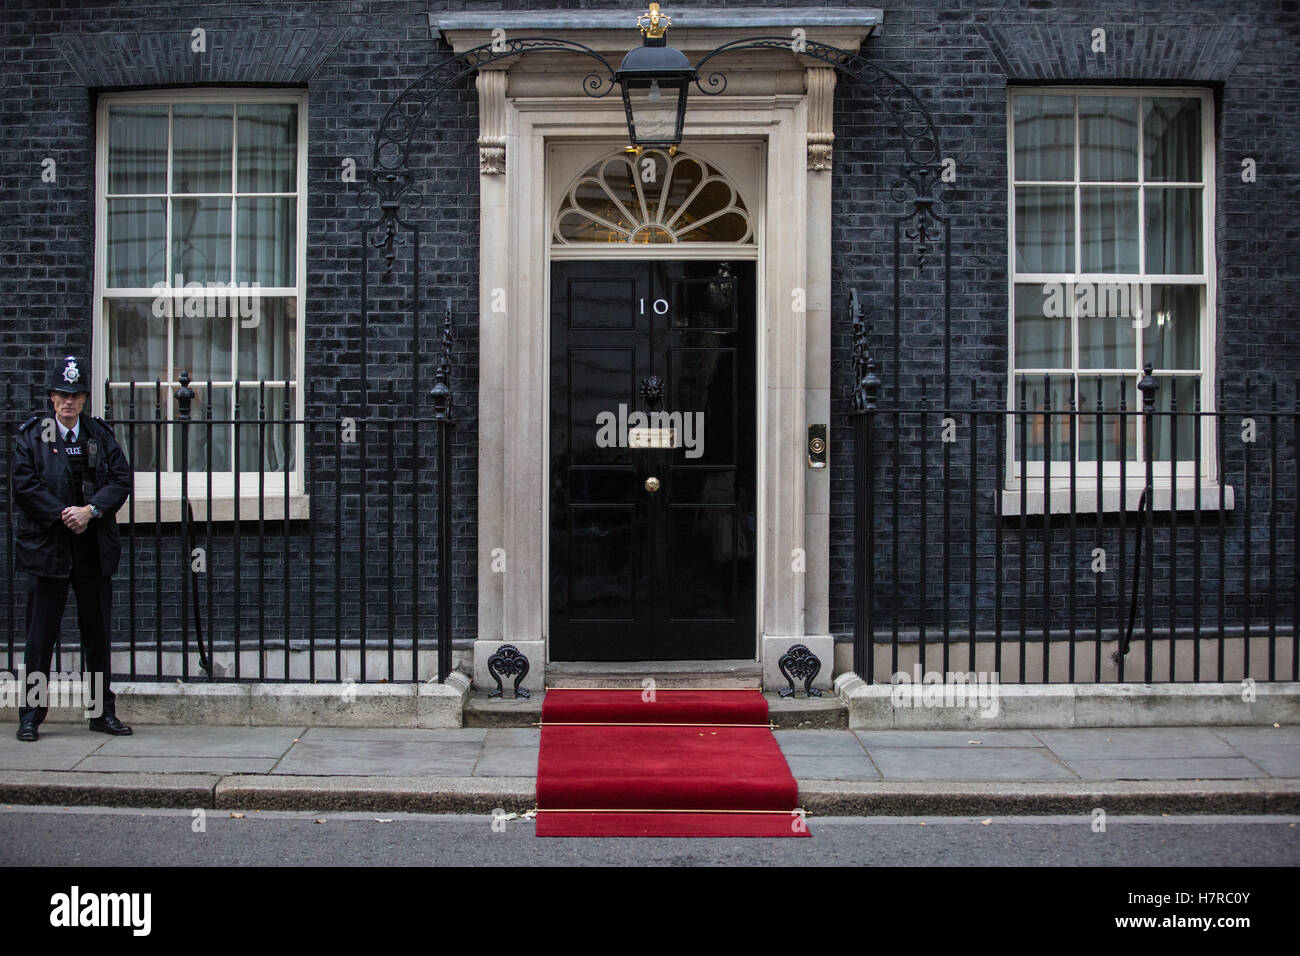 London, UK. 2nd November, 2016. A red carpet outside 10 Downing Street for President Juan Manuel Santos Calderón - Stock Image